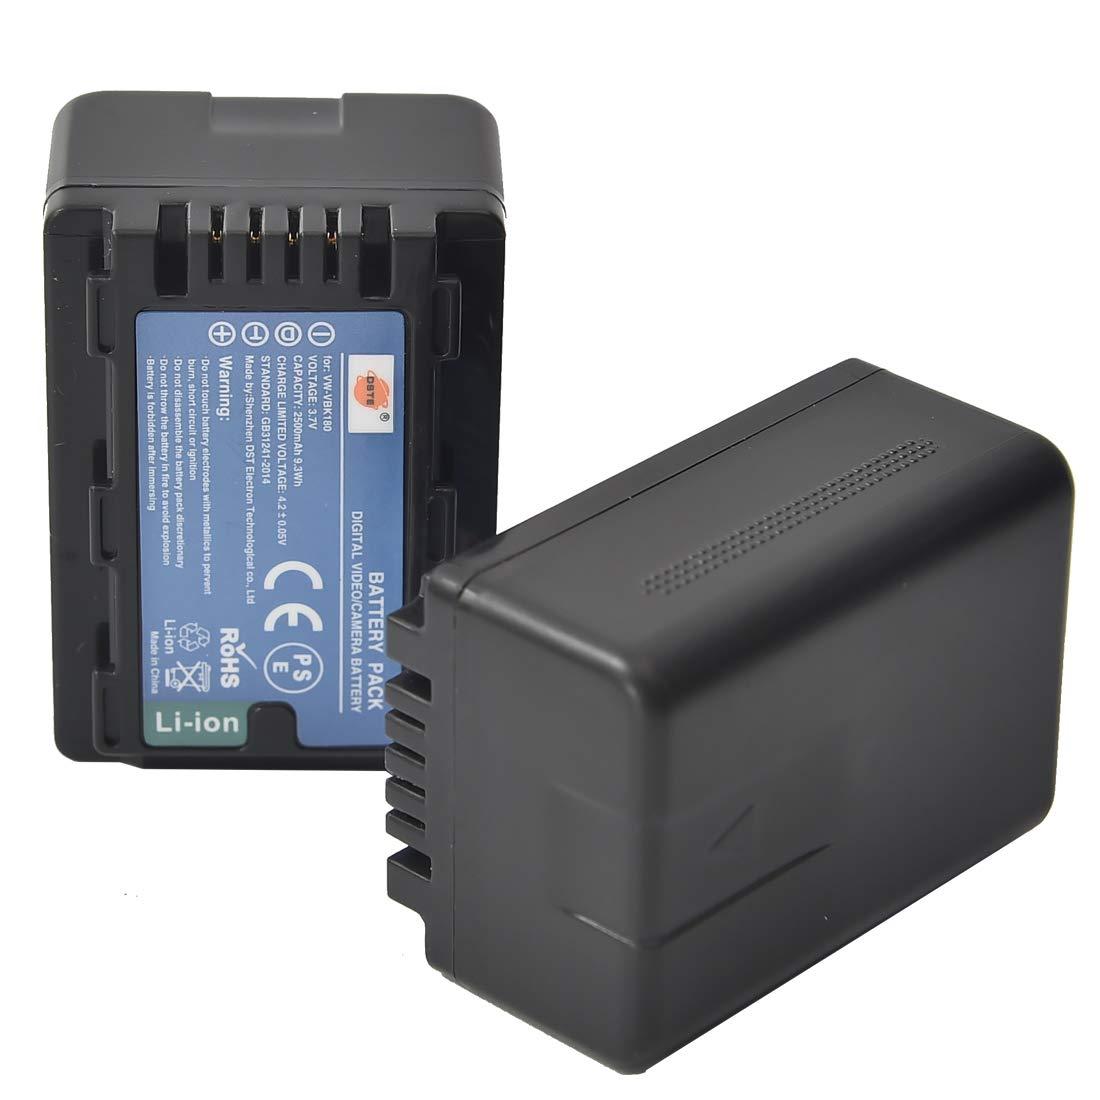 SDR-H85 SDR-H100 Cargador micro USB para Panasonic HDC-TM99